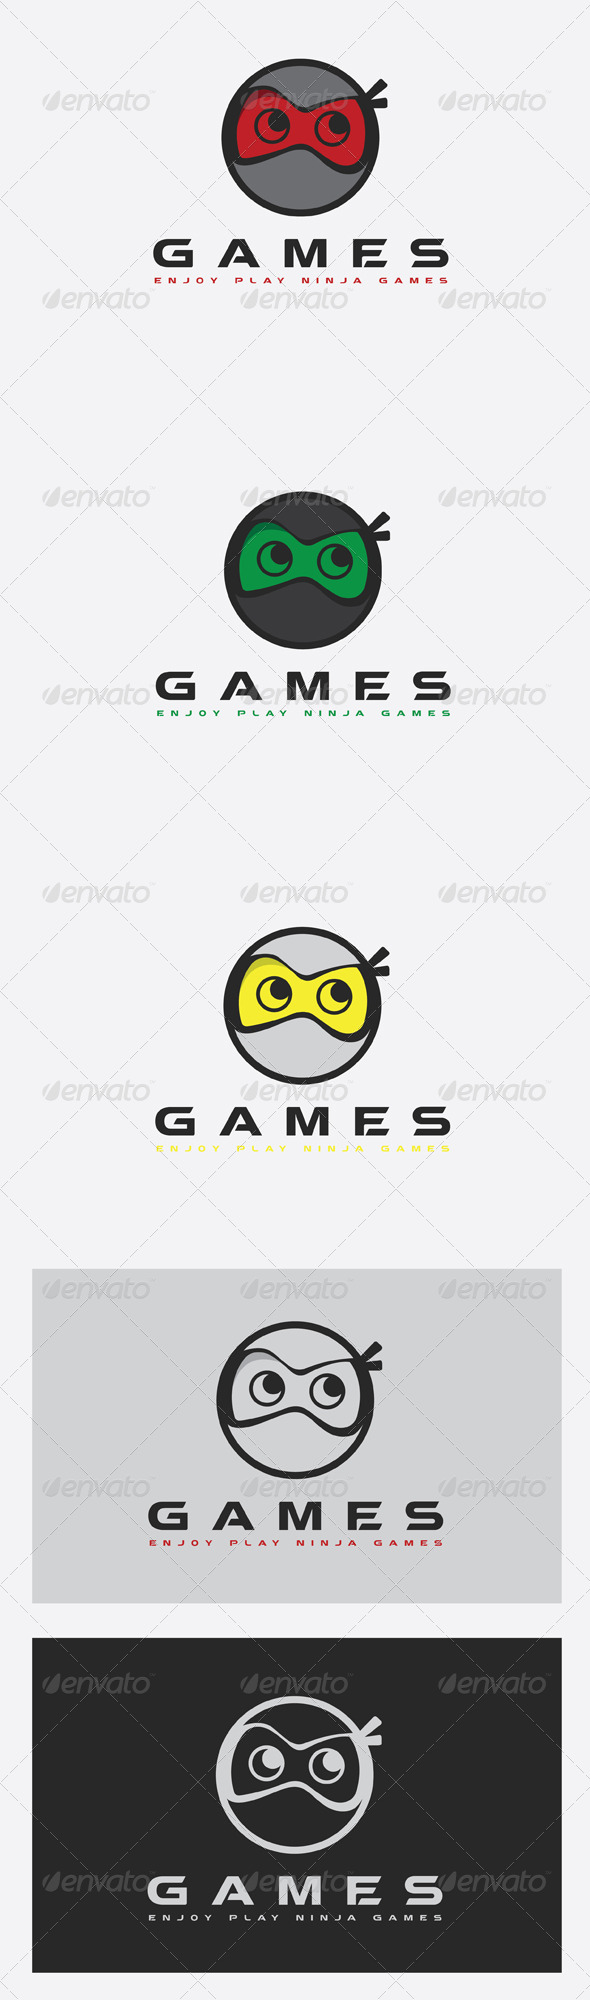 GraphicRiver Games Ninja Logo 6776310